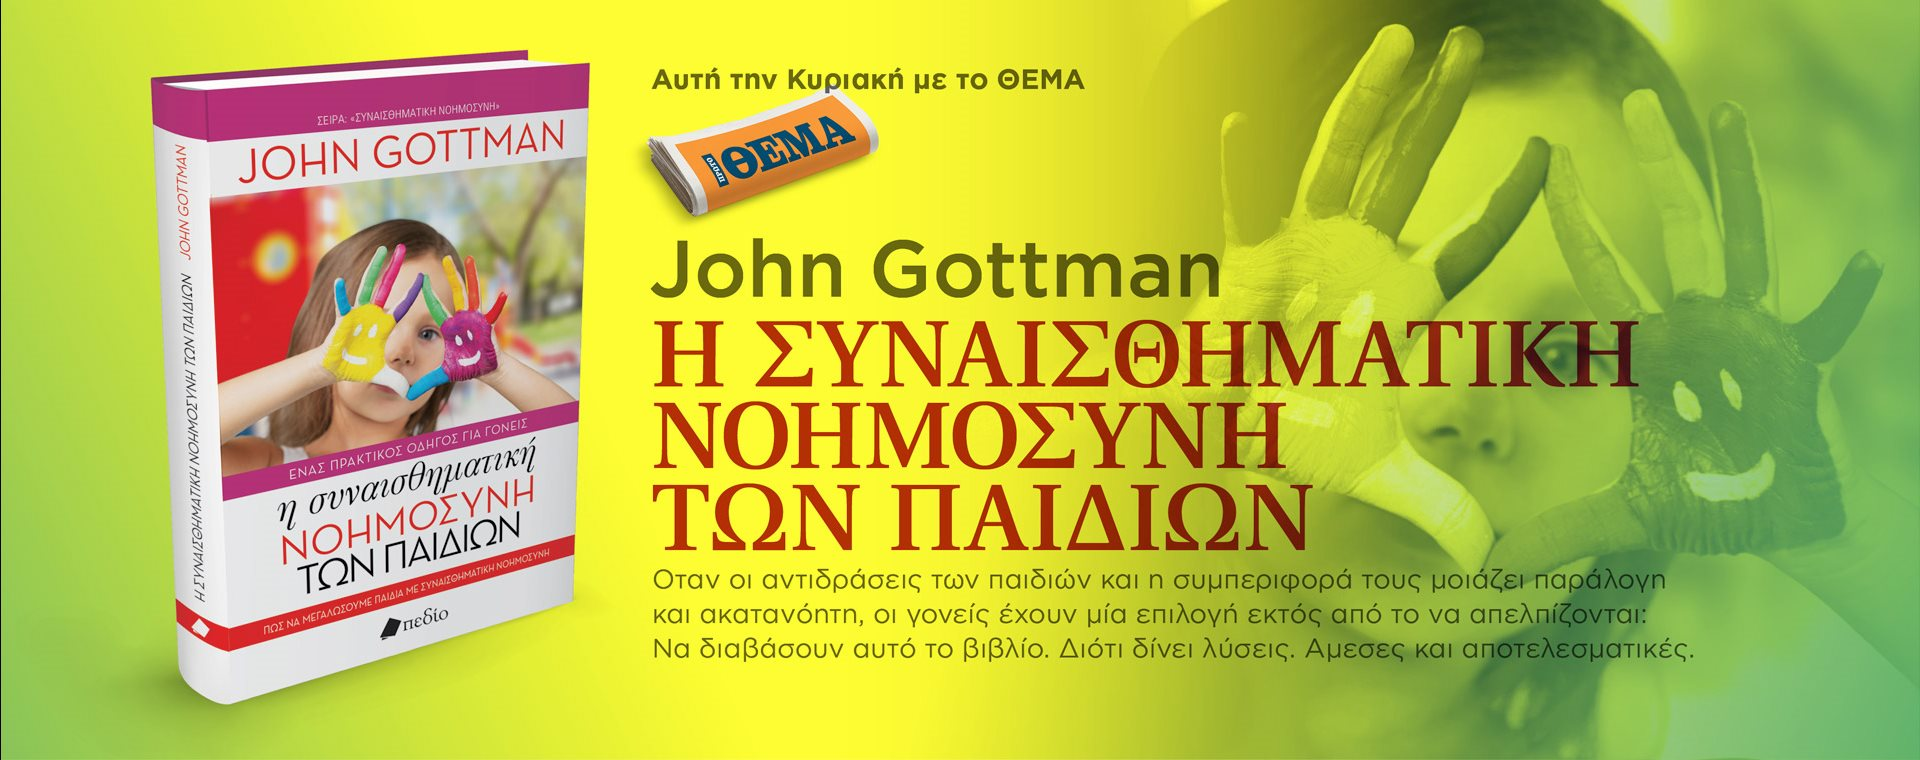 john_gottman_art